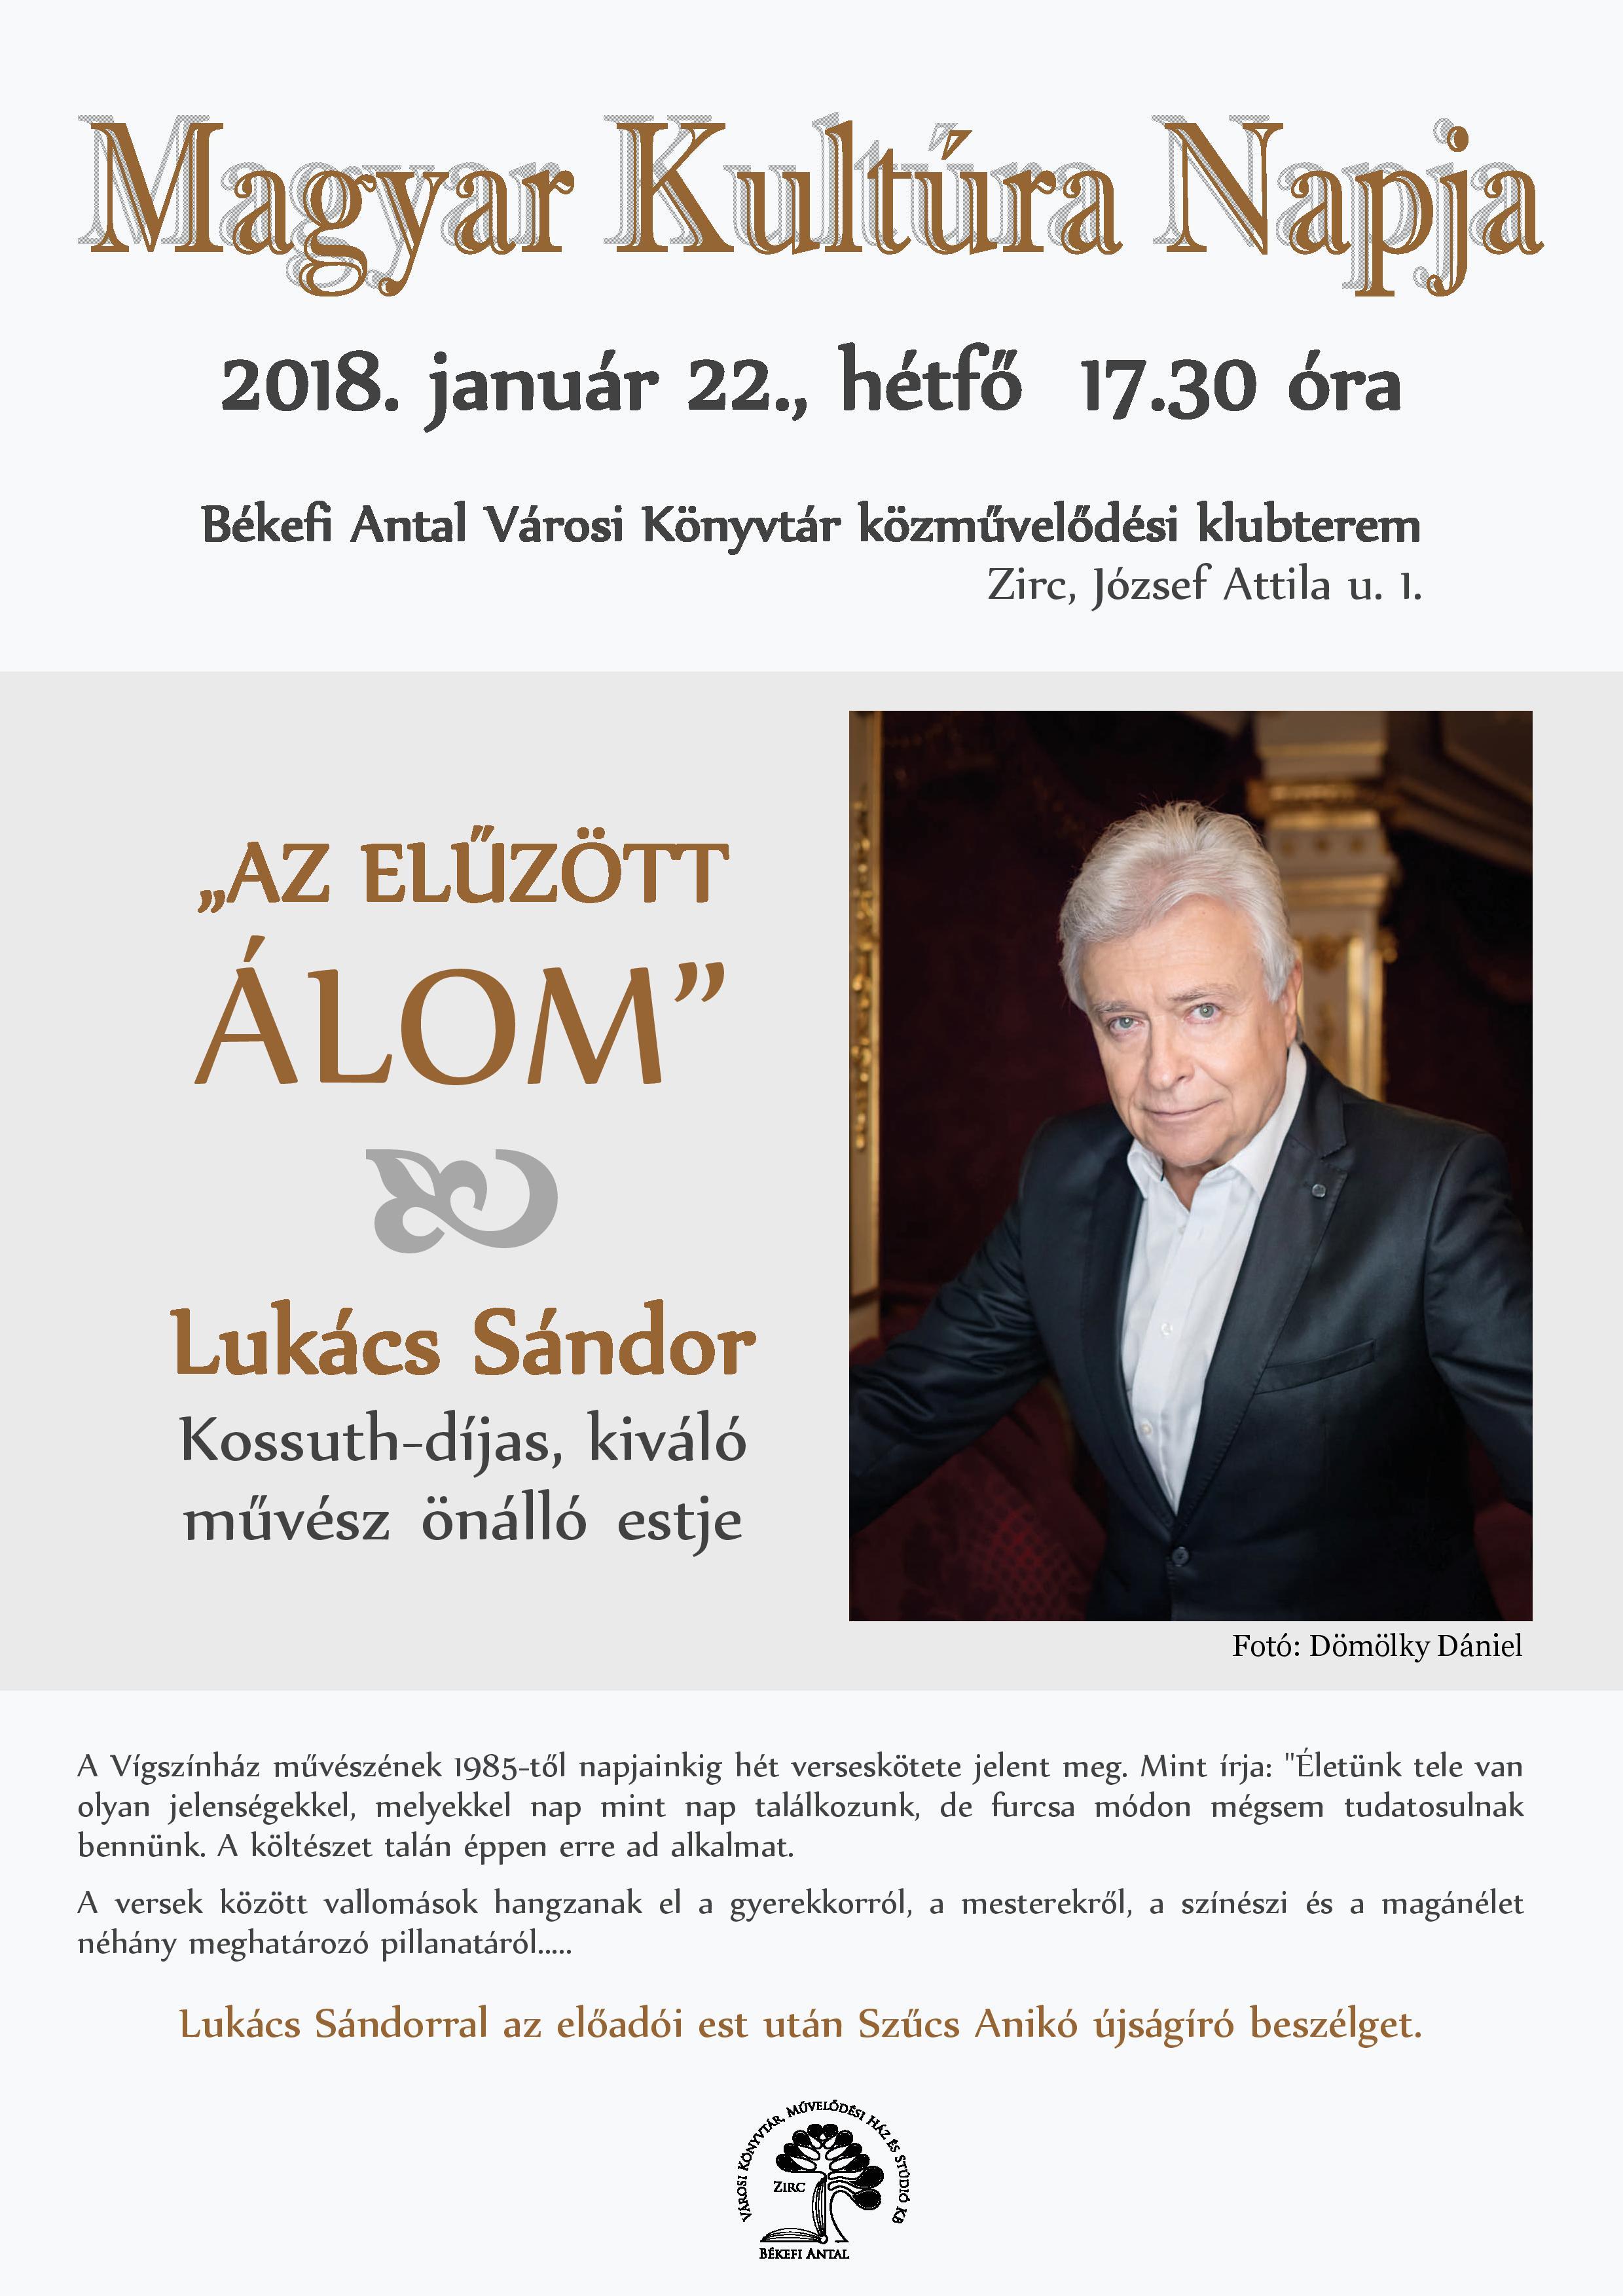 2018-01-22_magyar_kultura_napja_lukacs_sandor-page-001.jpg